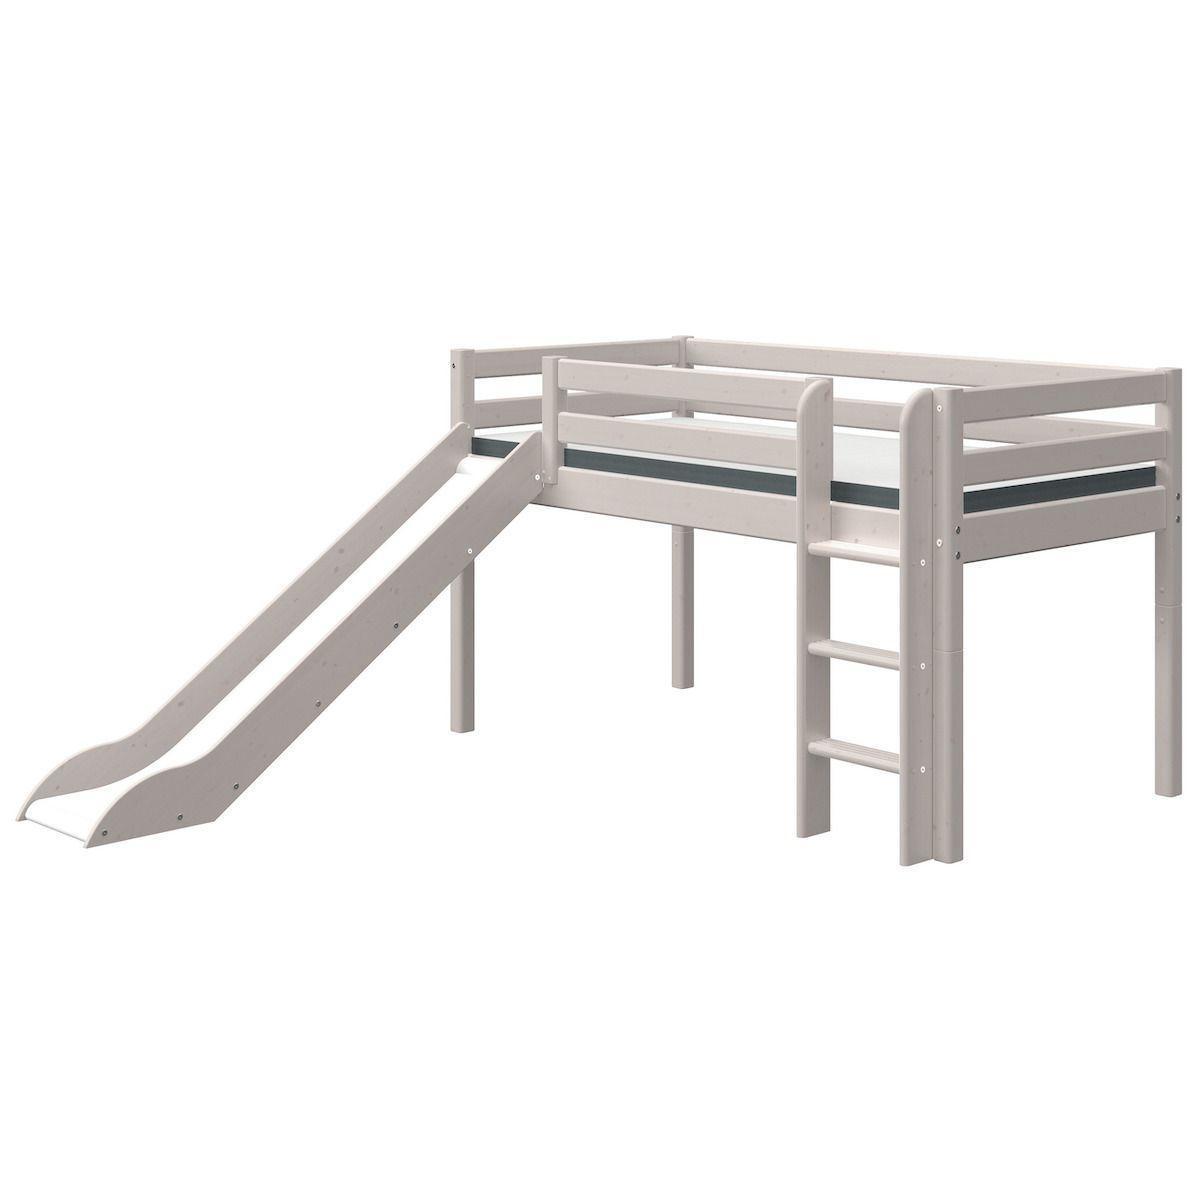 Cama media alta 90x190cm escalera recta-tobogán CLASSIC Flexa grey washed